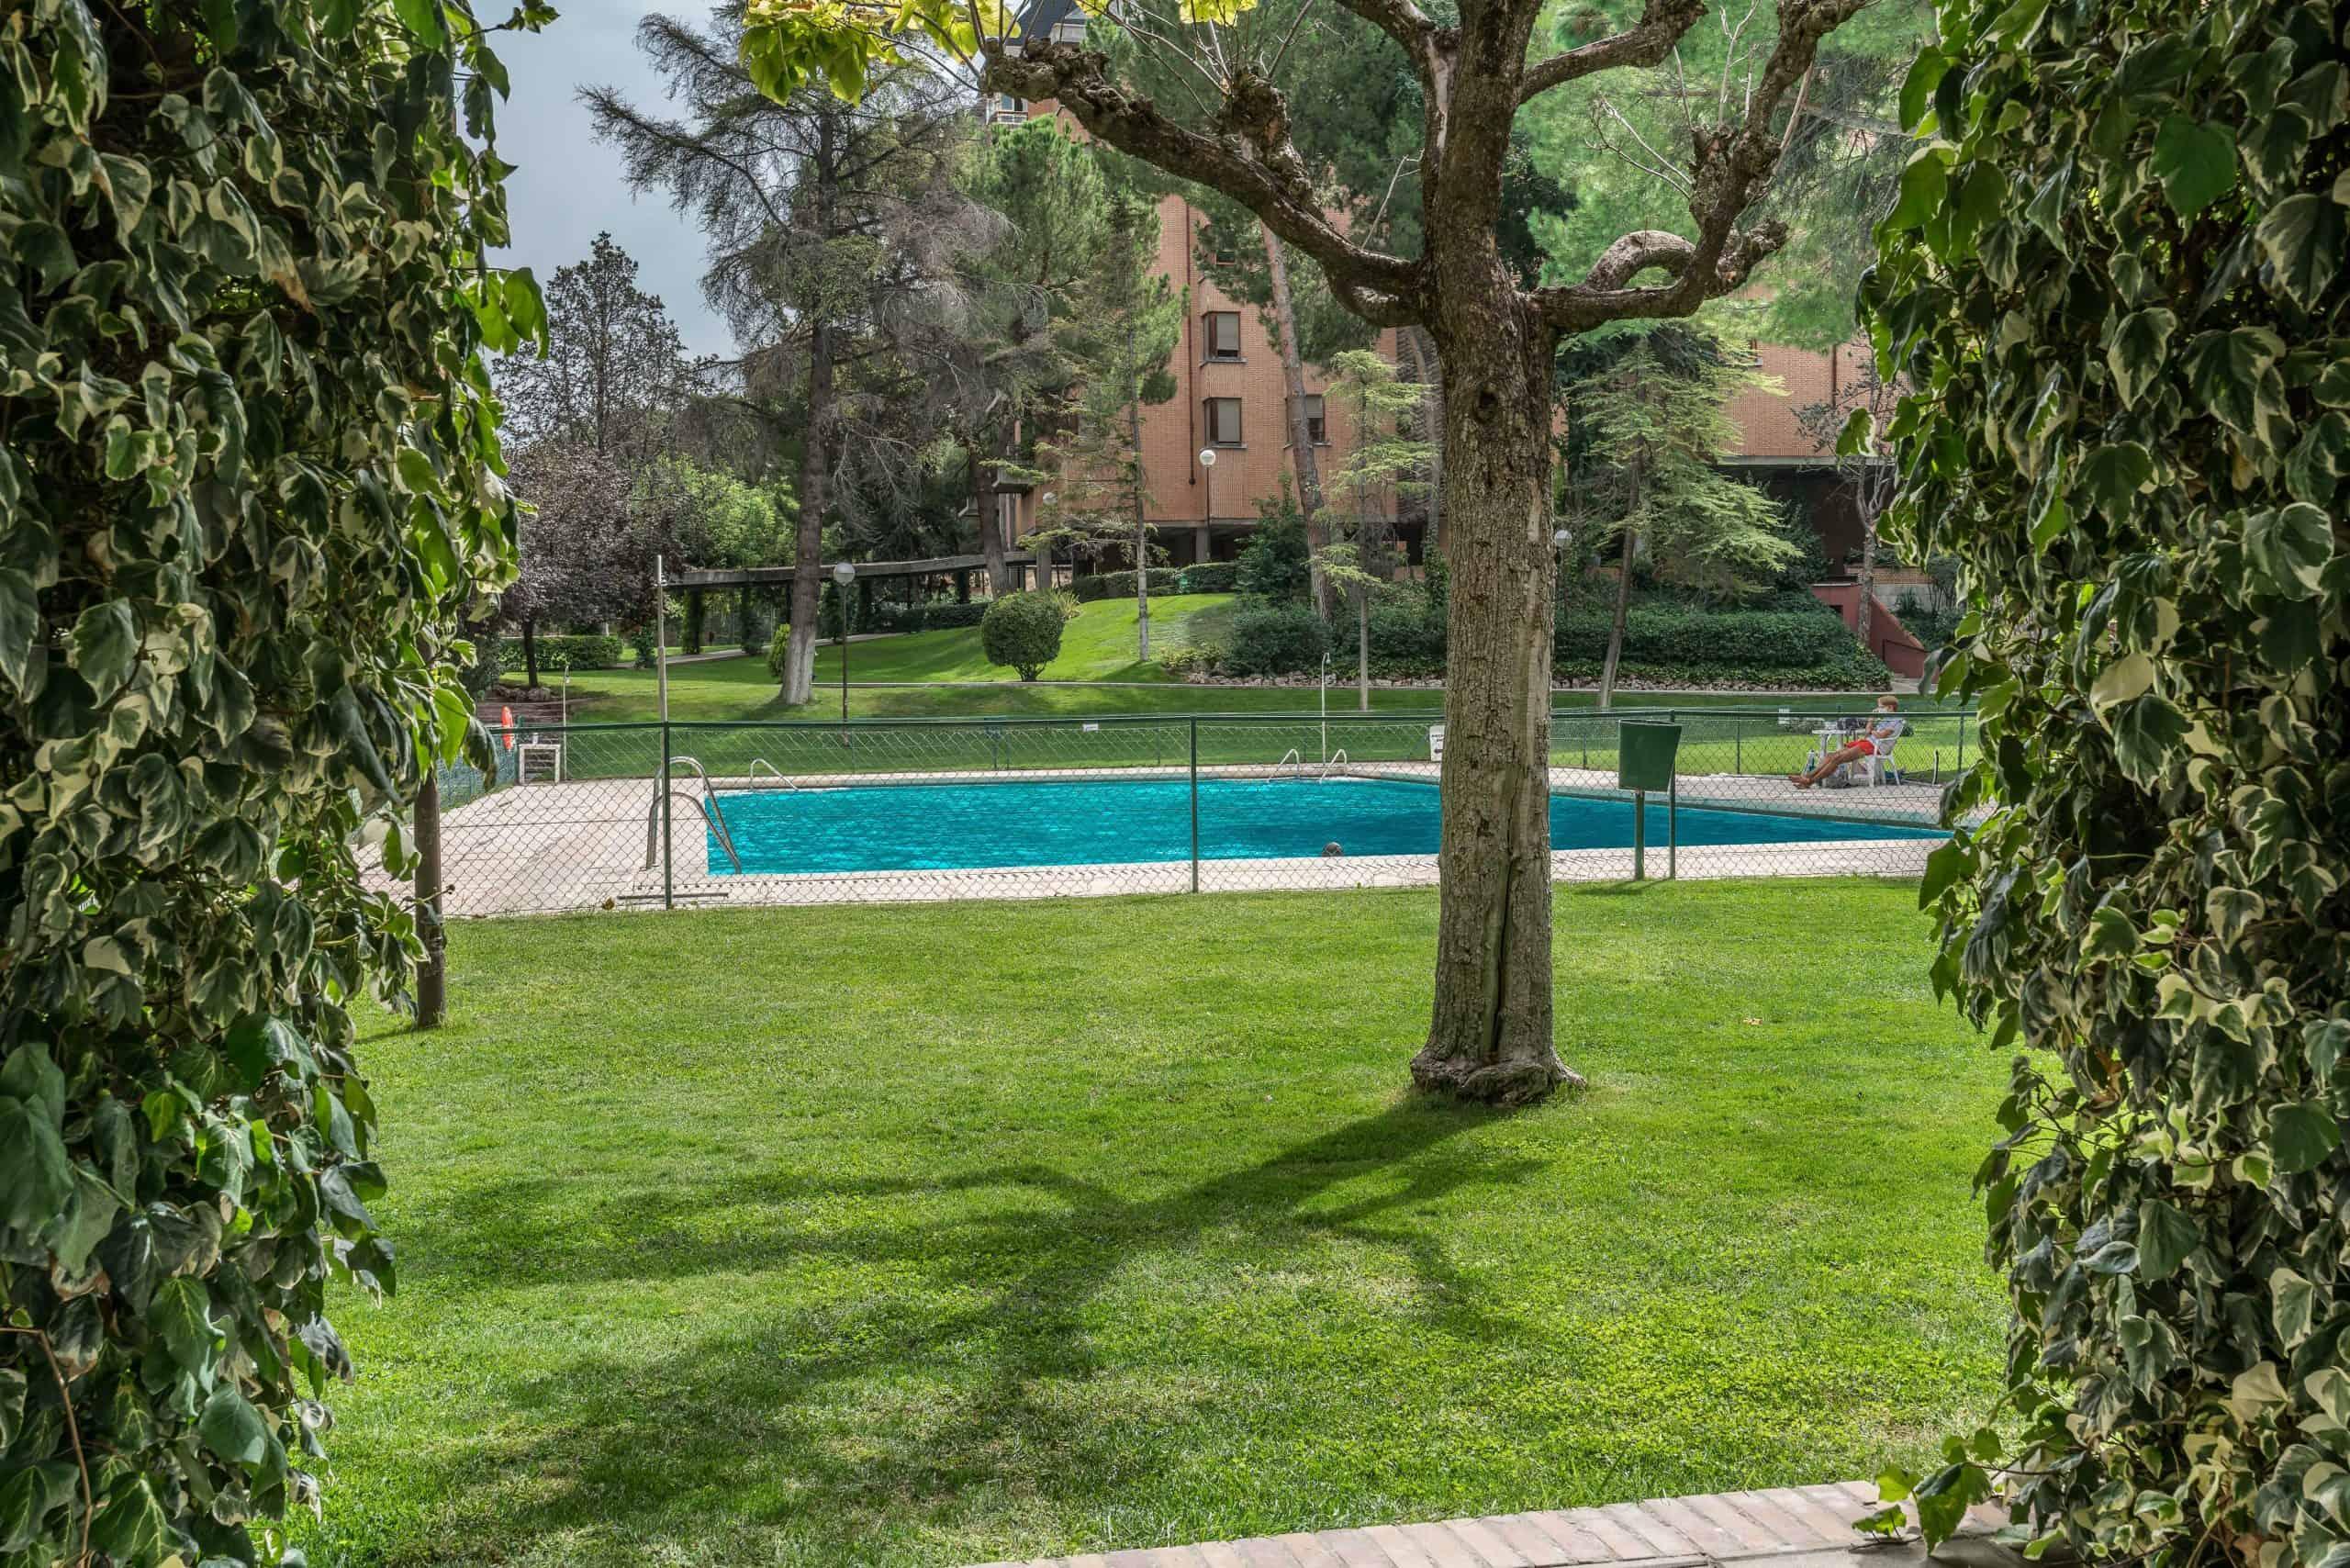 Agencia Inmobiliaria de Madrid-FUTUROCASA-Zona ARGANZUELA-EMBAJADORES-LEGAZPI -calle Embajadores- baño 172